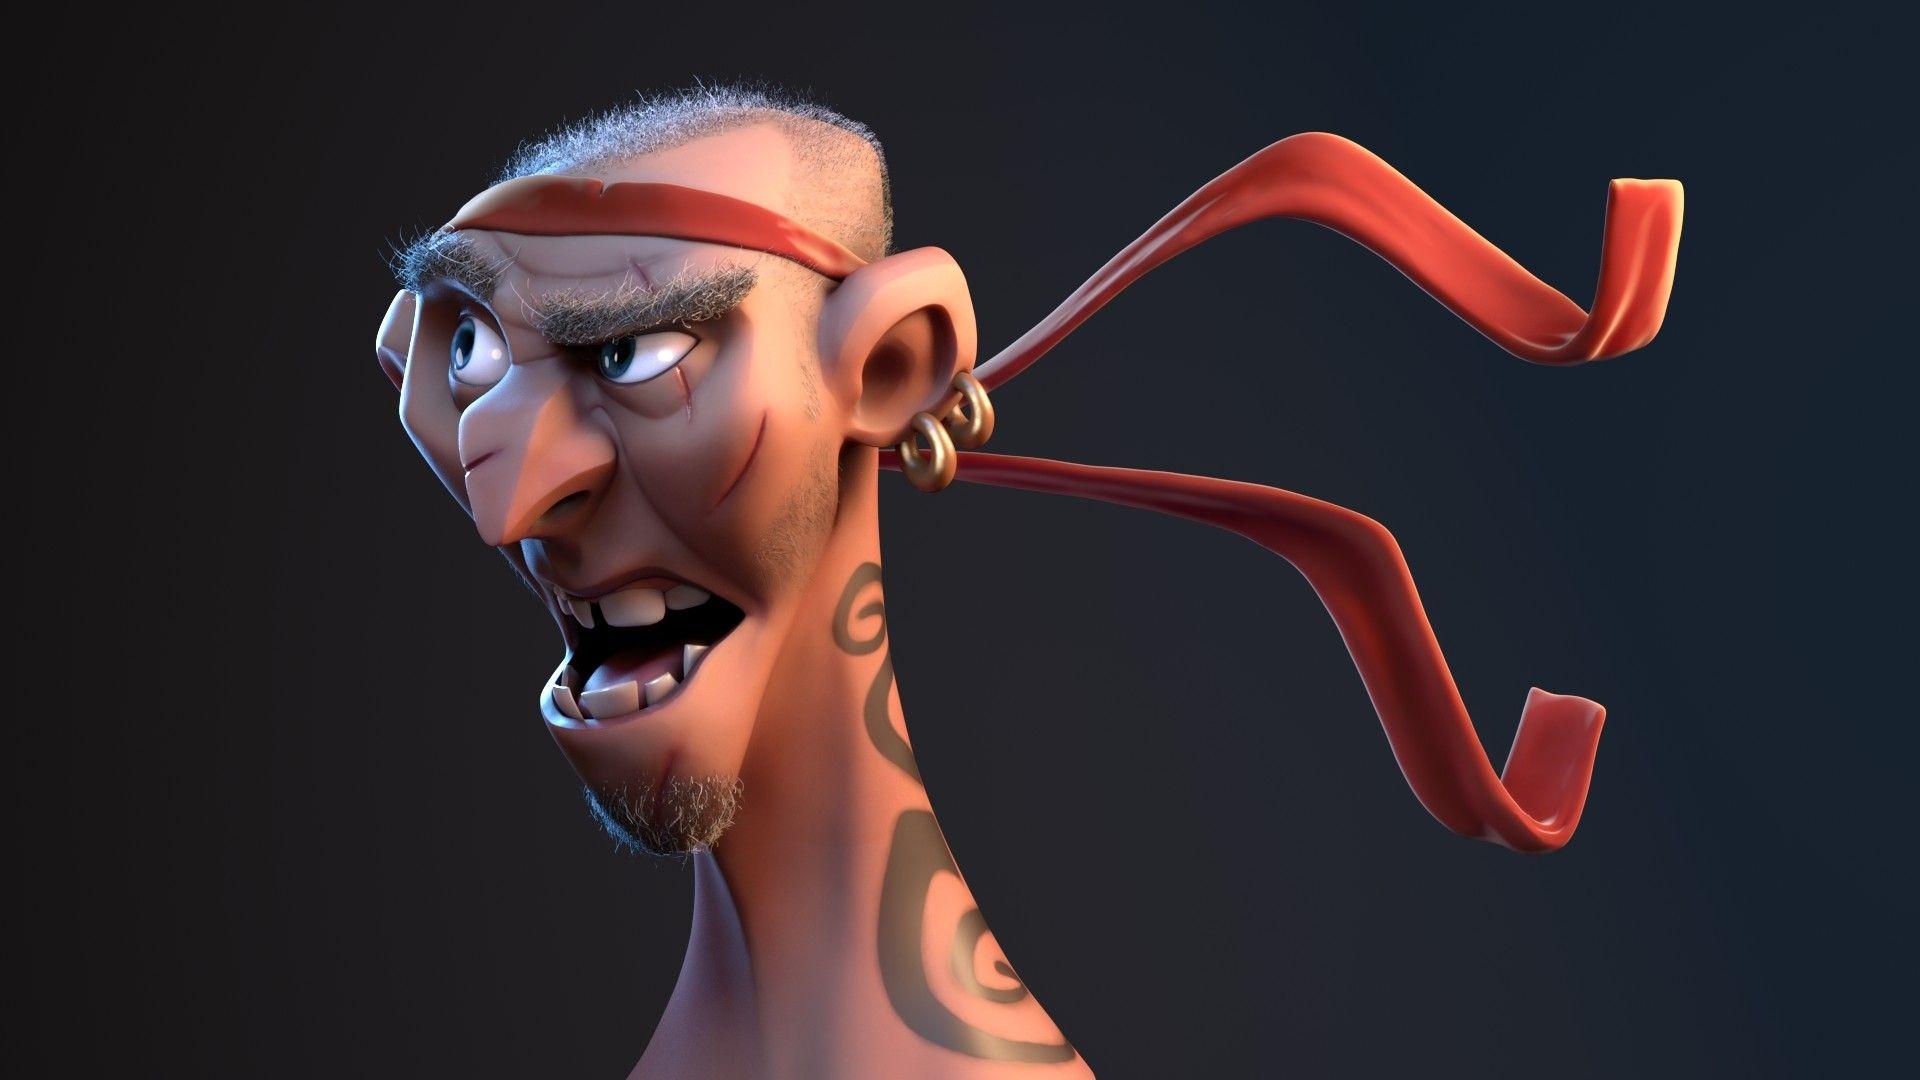 ArtStation - Pirate, Magdy Kovo